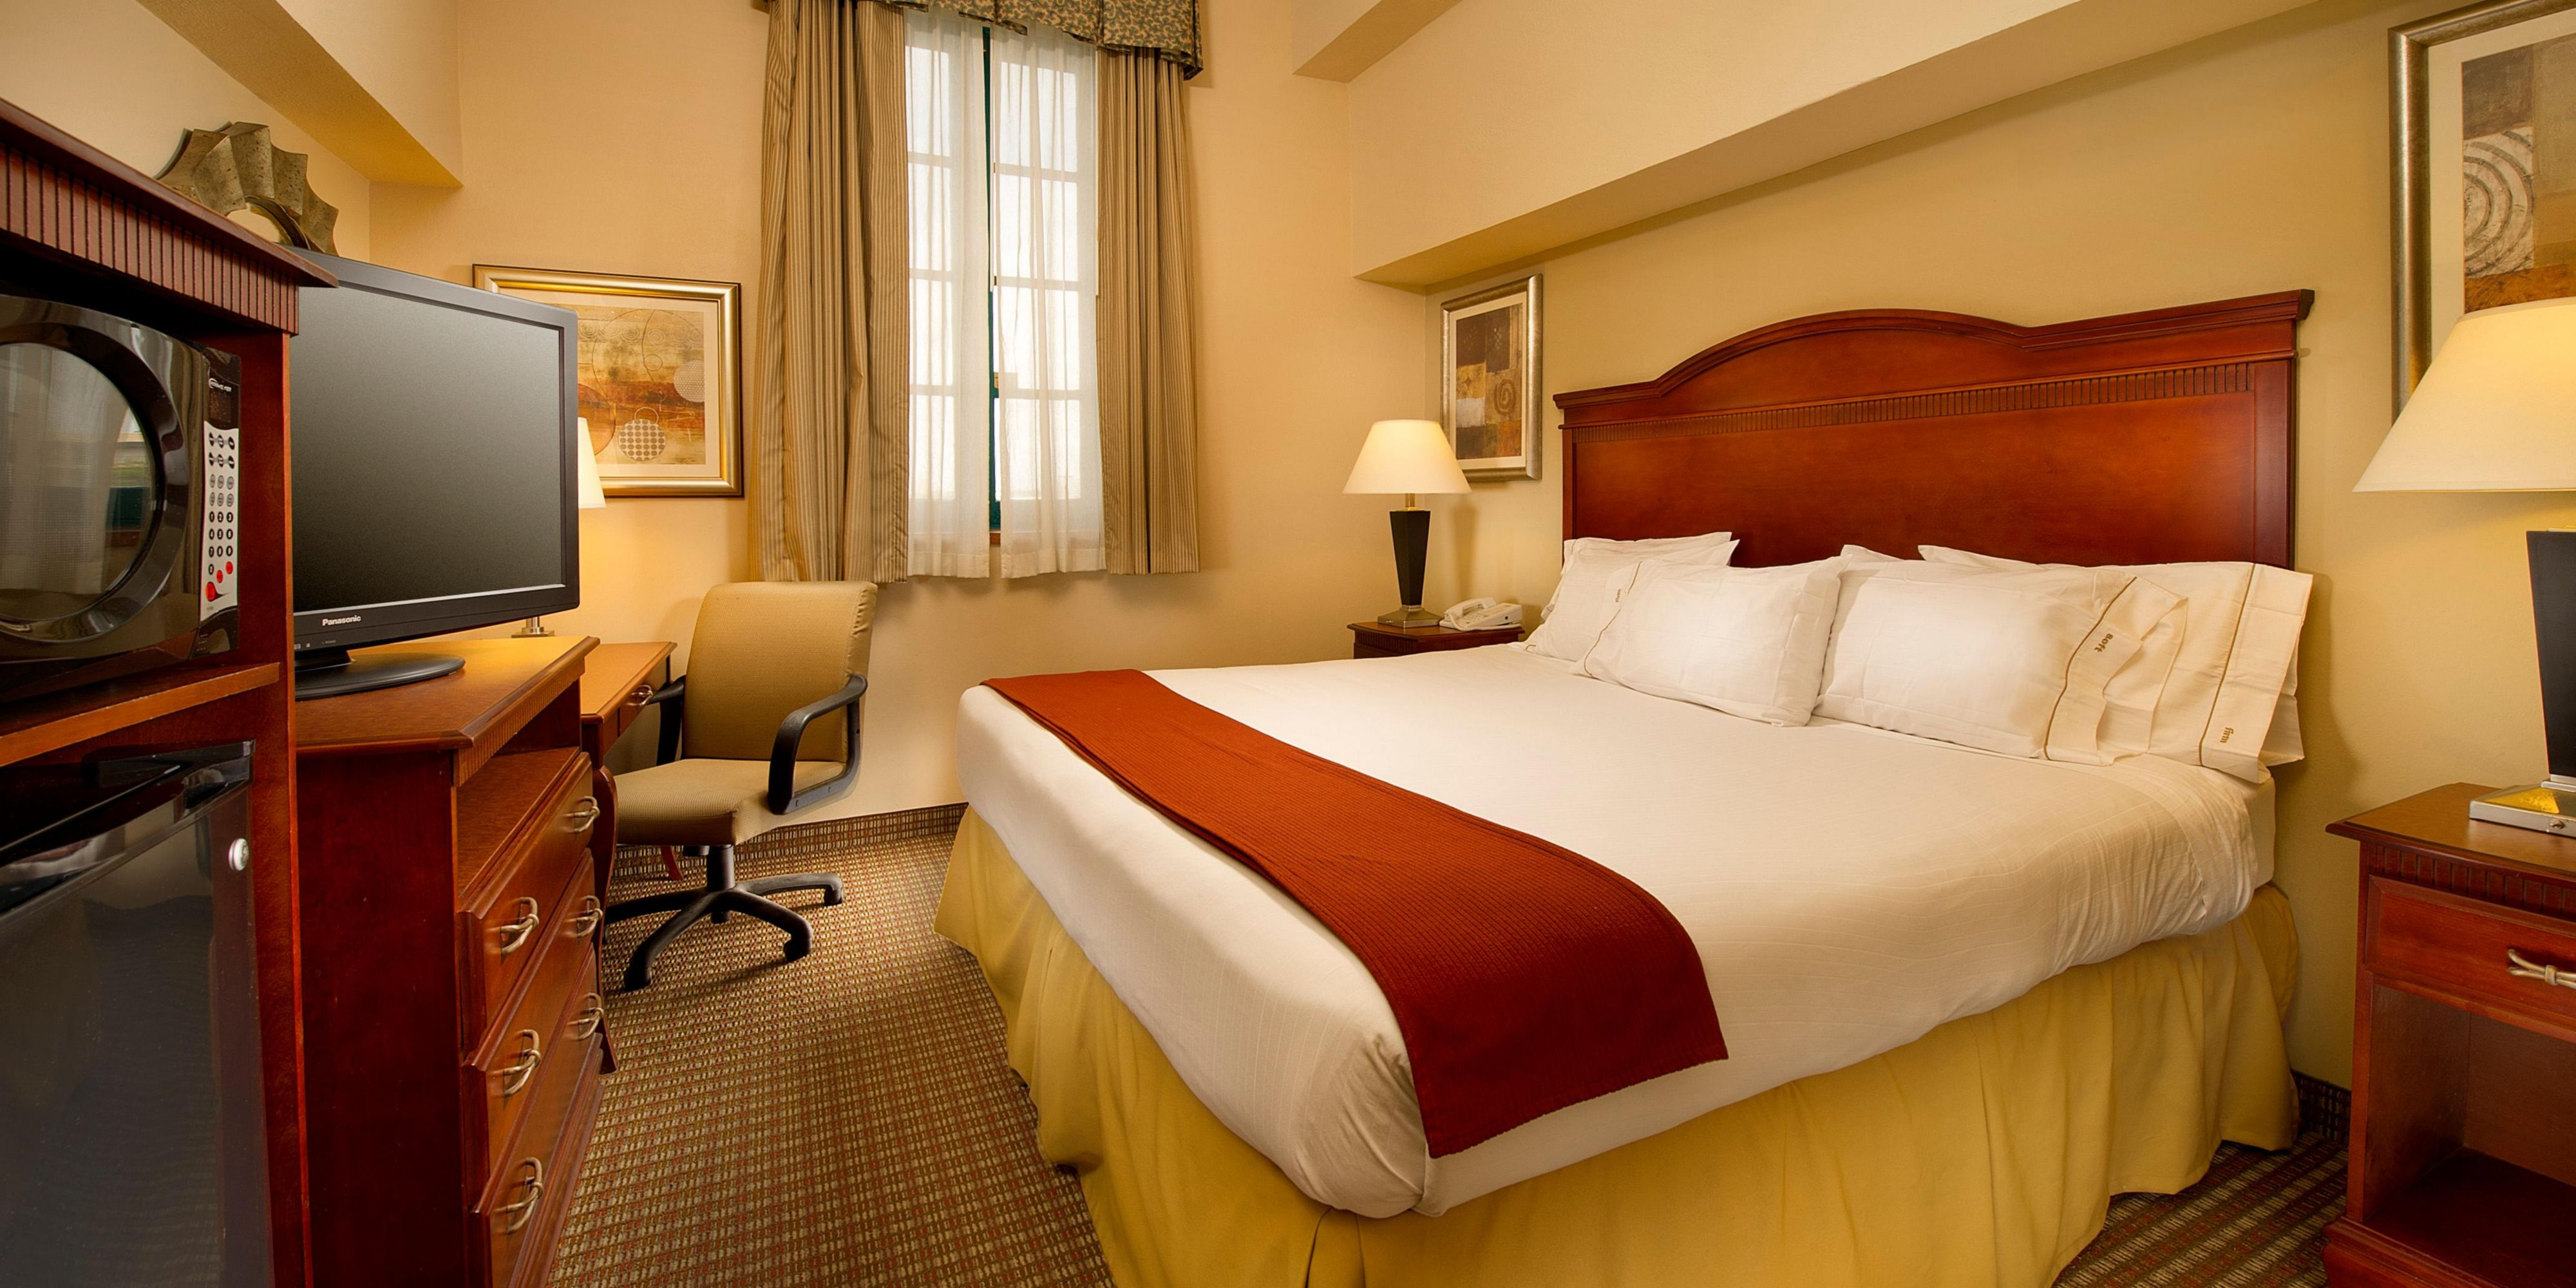 Holiday Inn Express San Antonio N Riverwalk Area Hotel by IHG holiday inn express san antonio             x